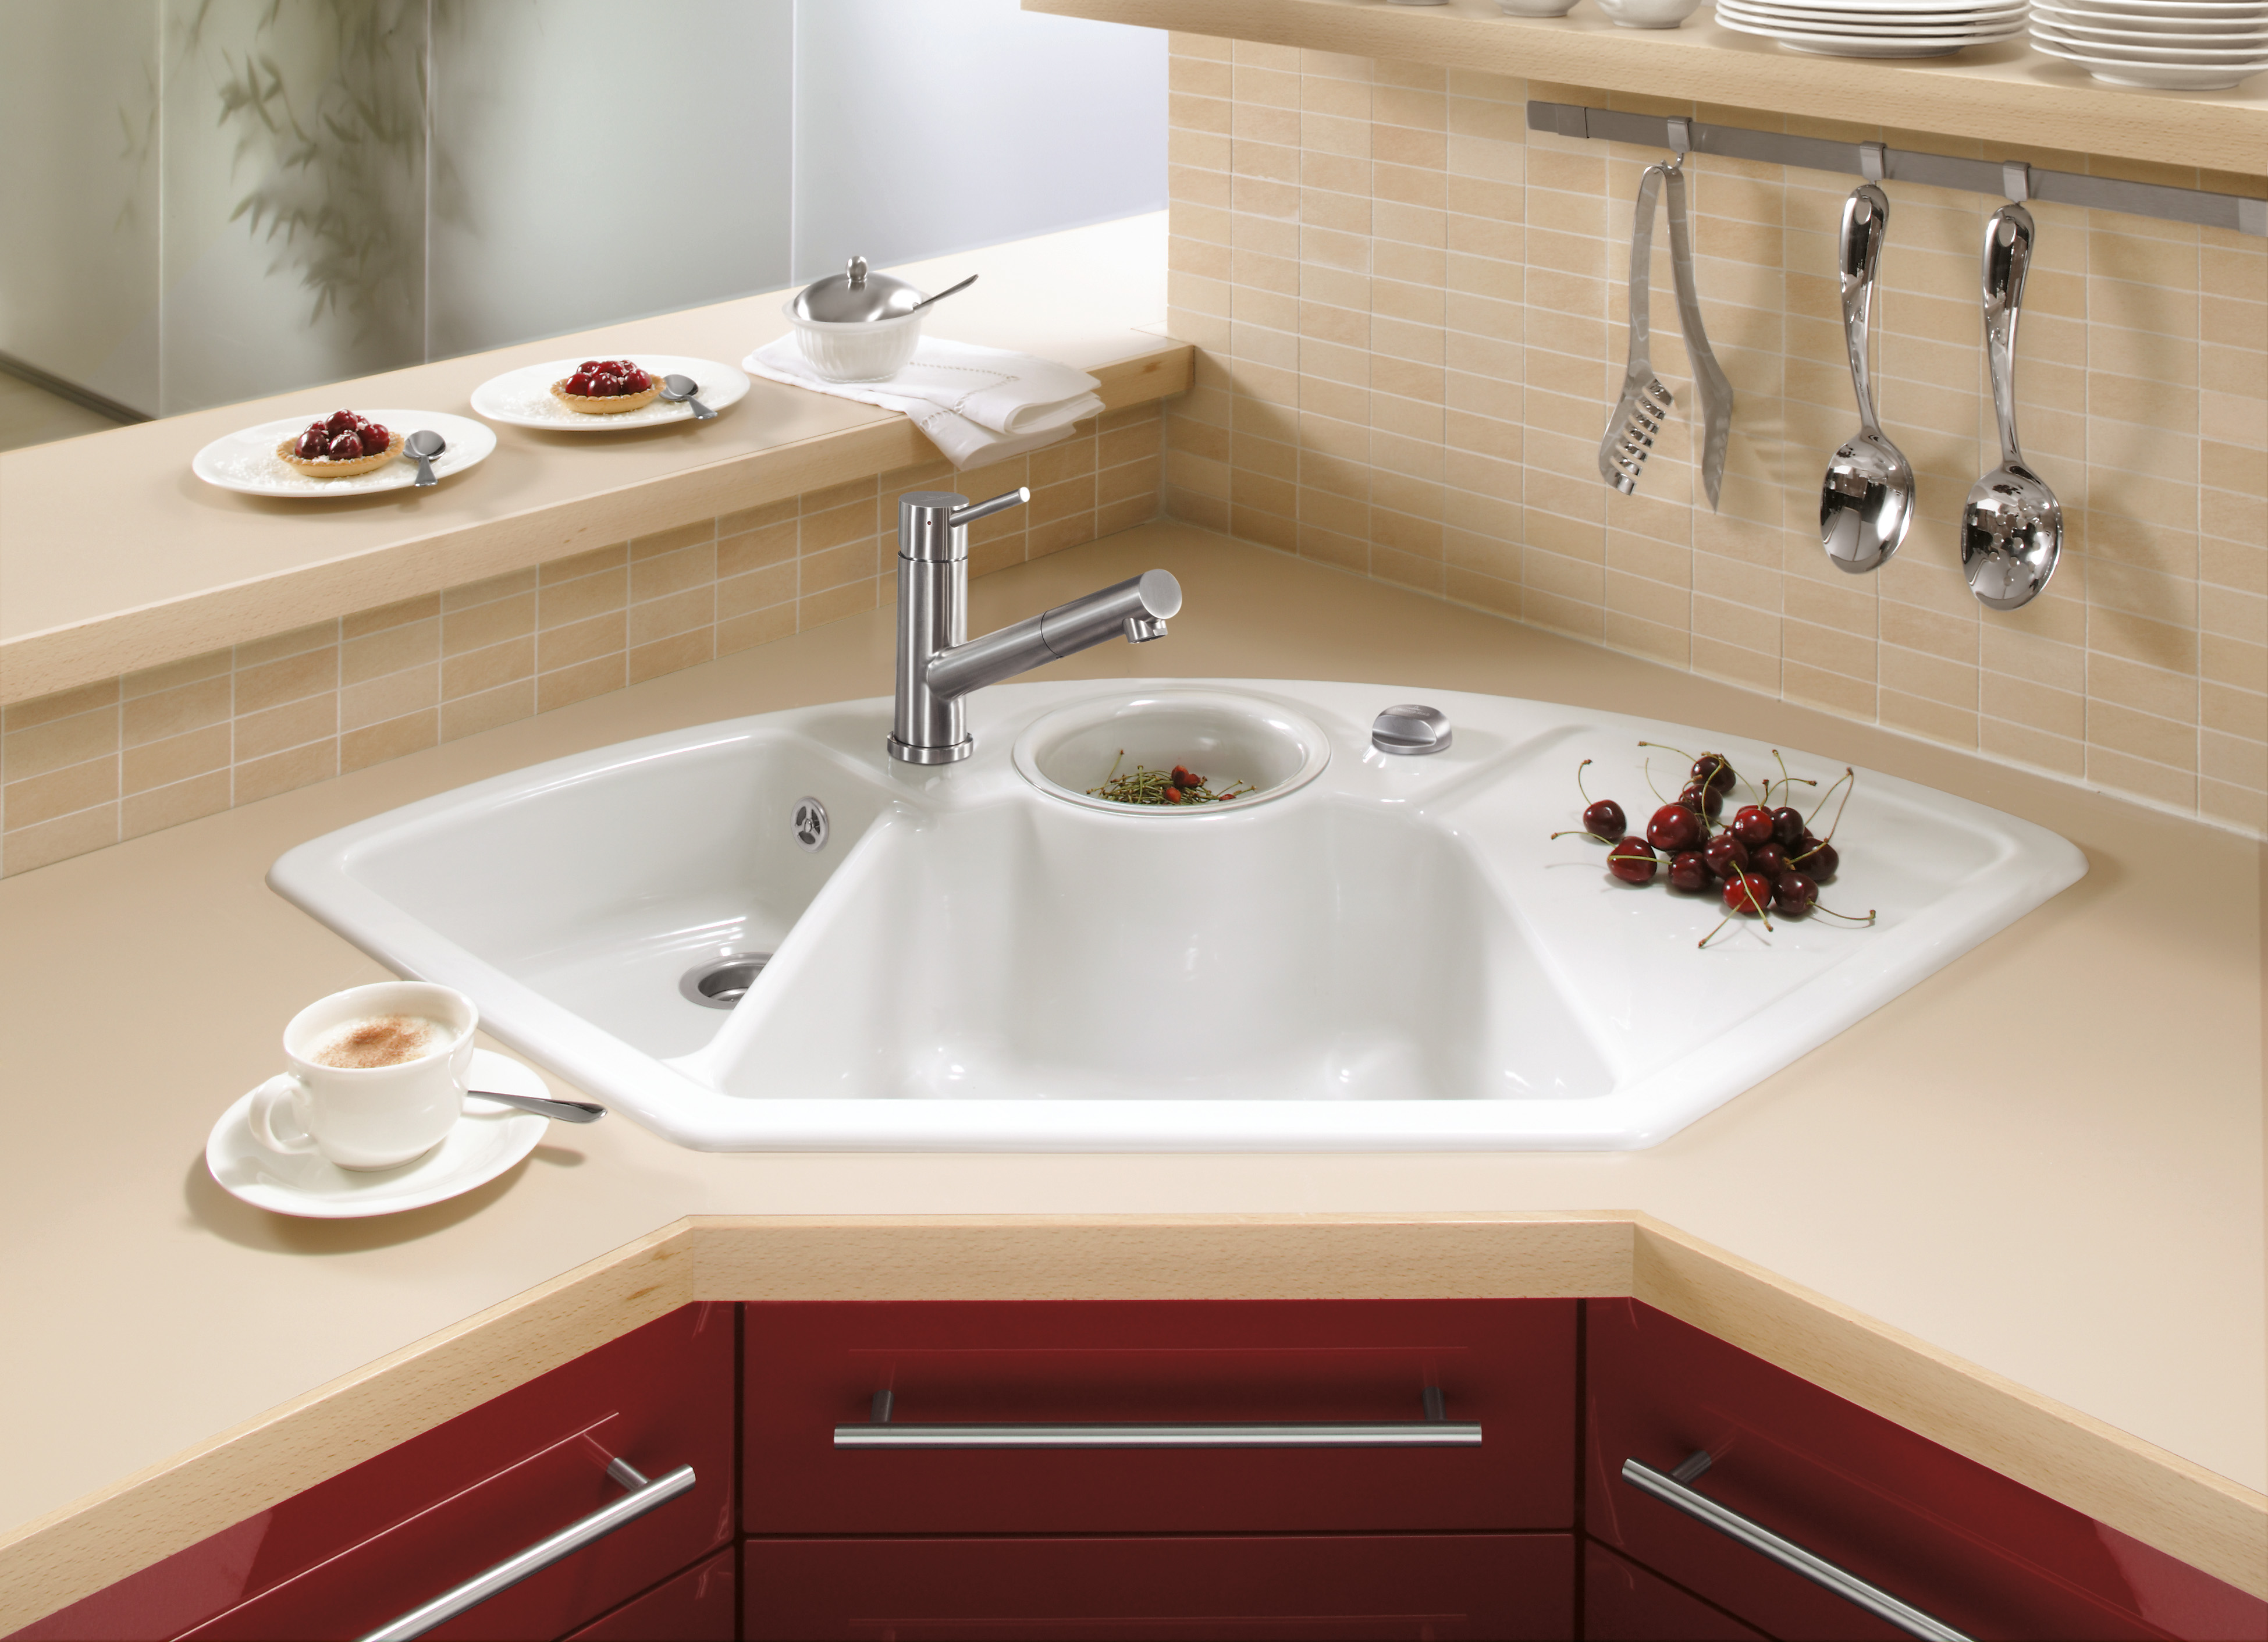 Solo Corner Butler sink, Corner sink, Corner sinks